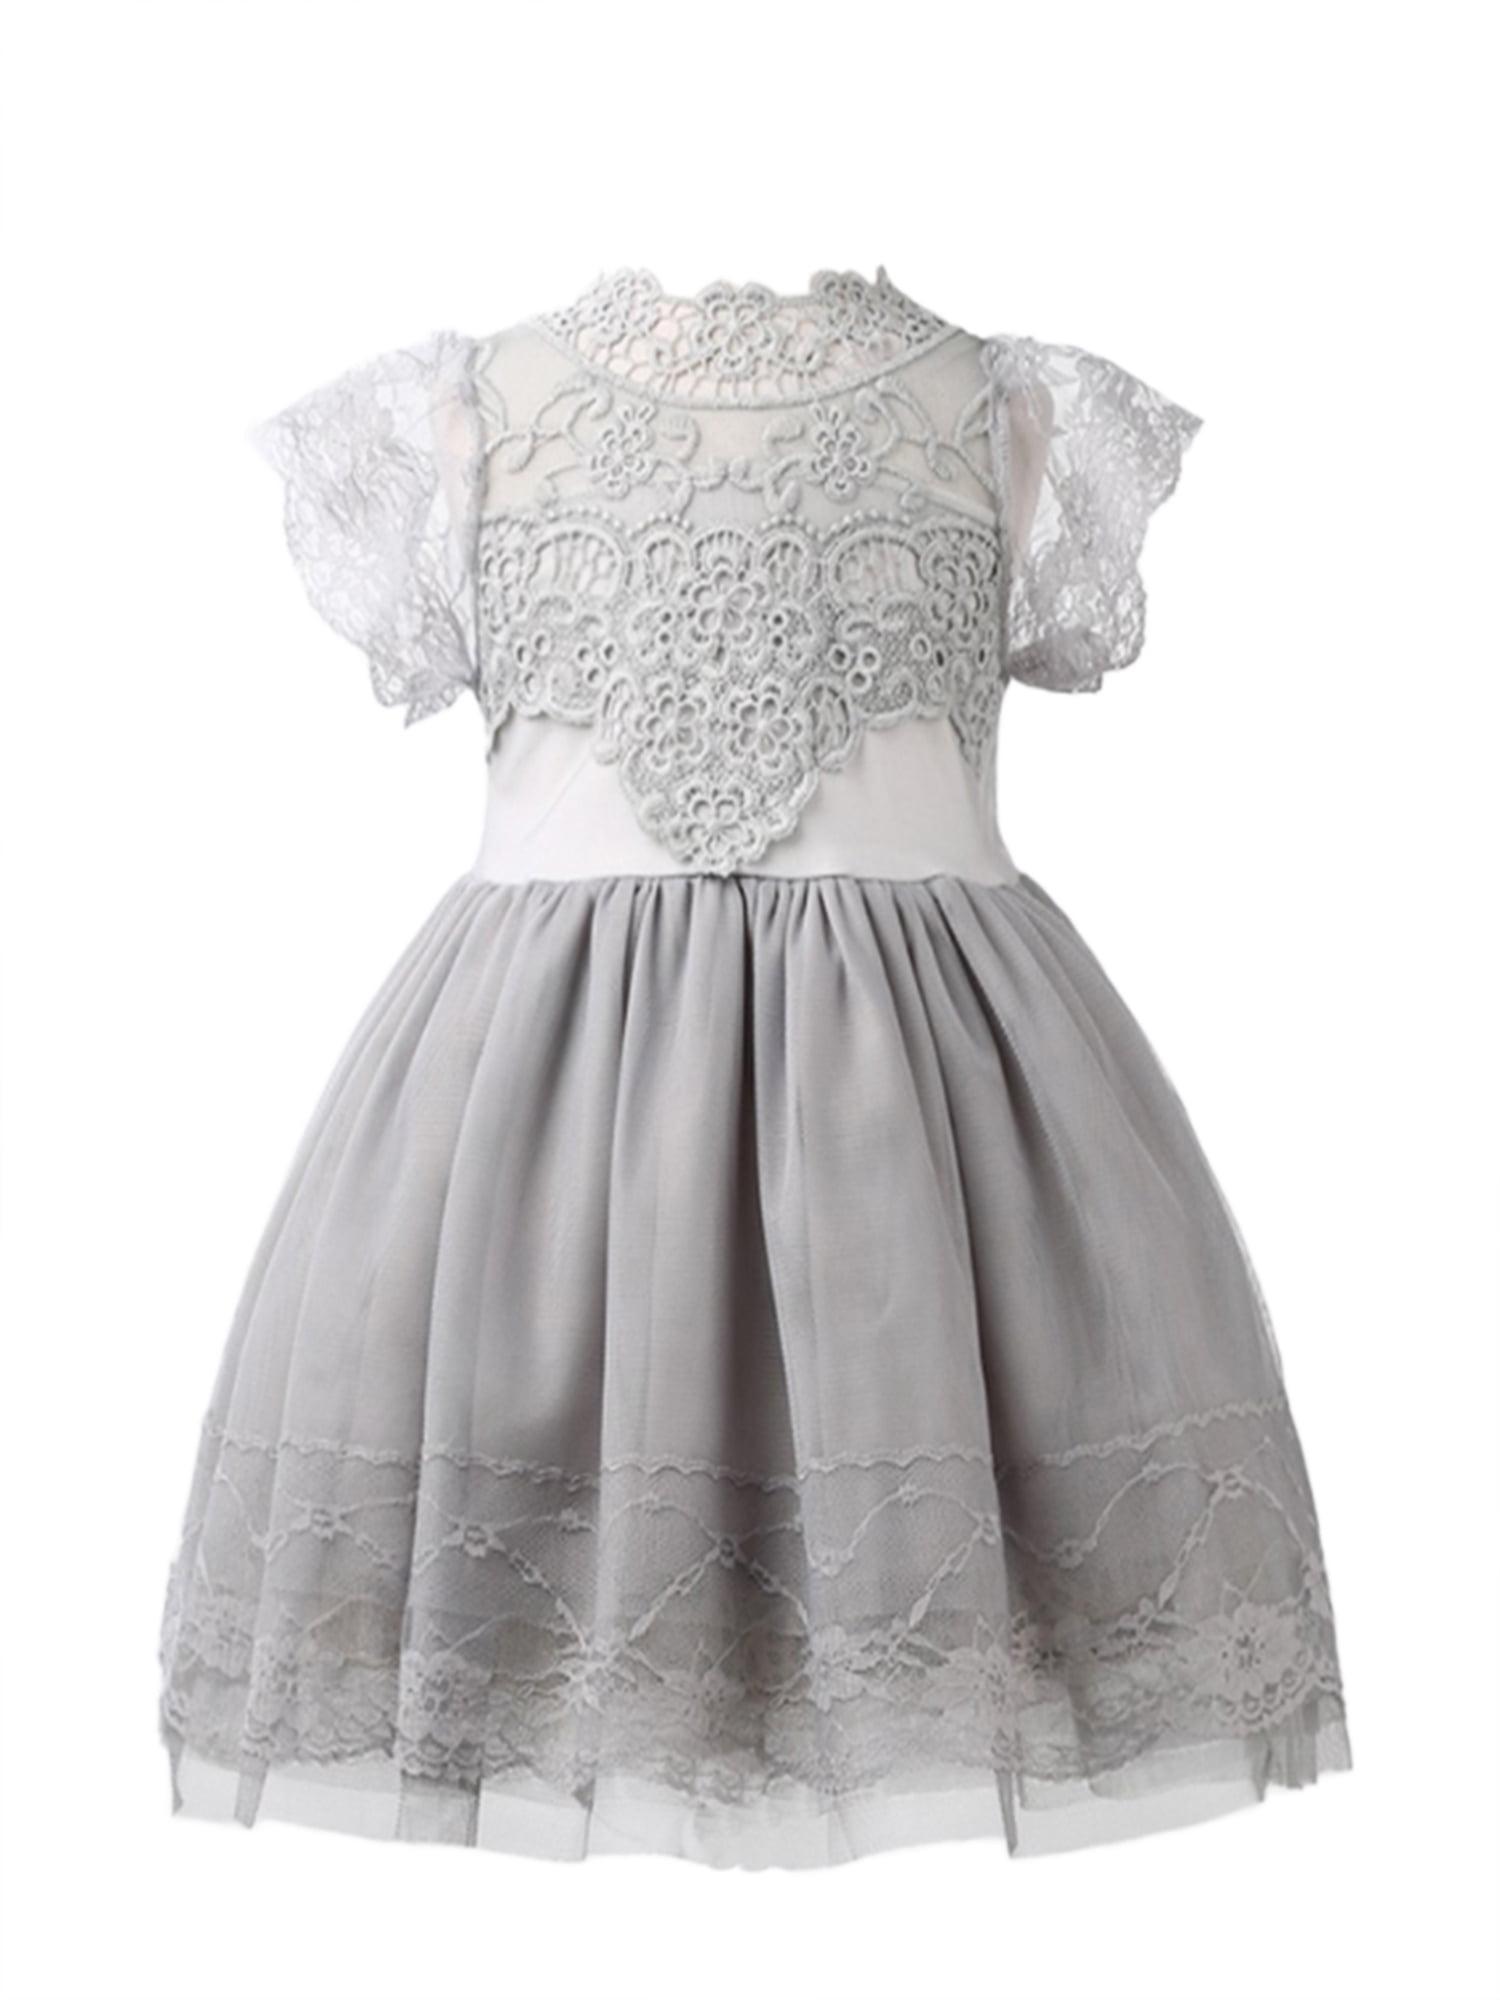 StylesILove Victorian Lace Princess Flower Girl Dress (1-2 Years, Grey)